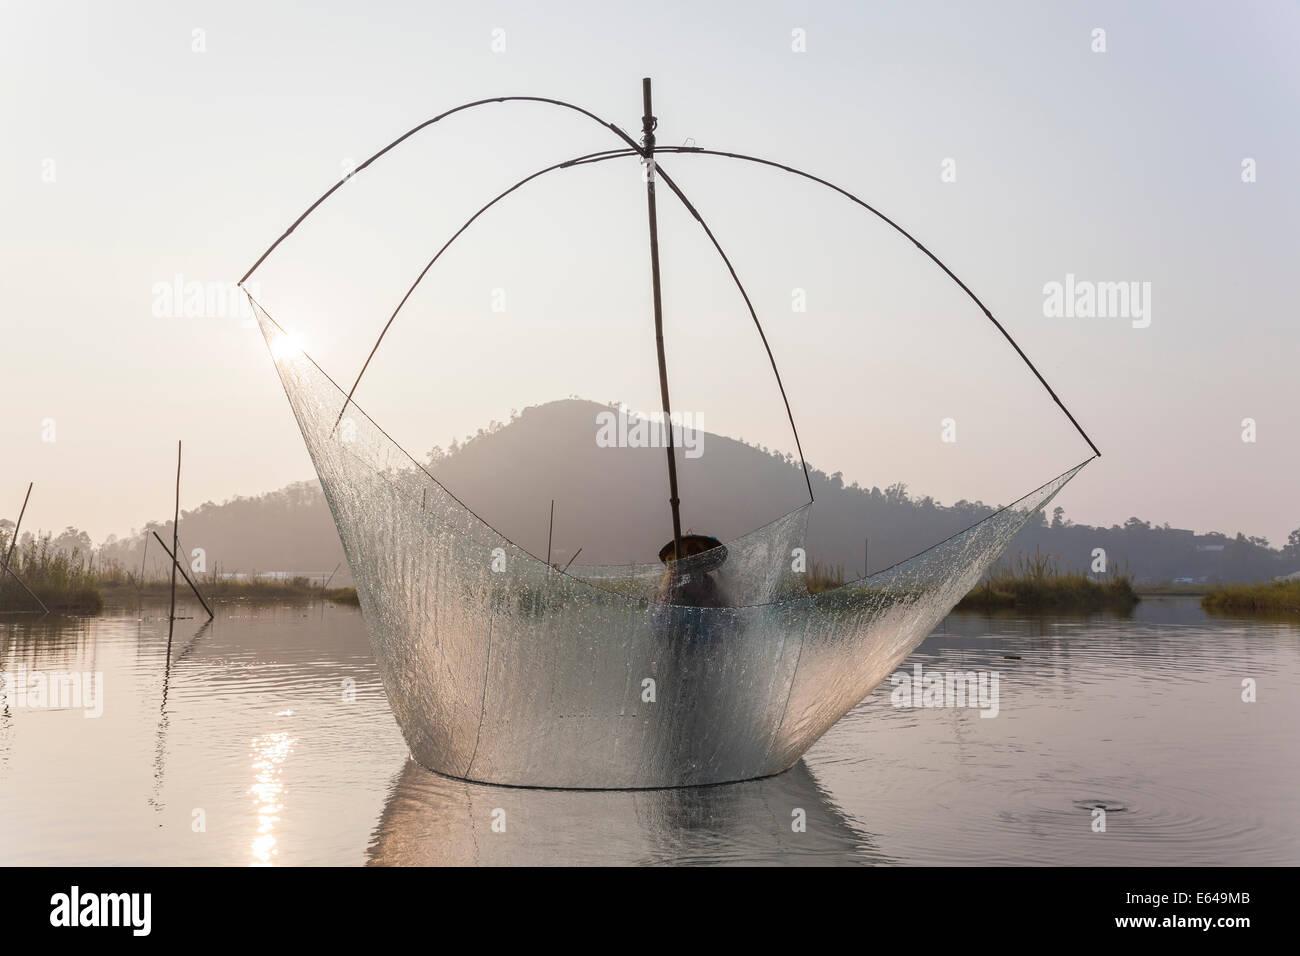 Pesca, Lago Loktak, nr Imphal, Manipur, India Imagen De Stock